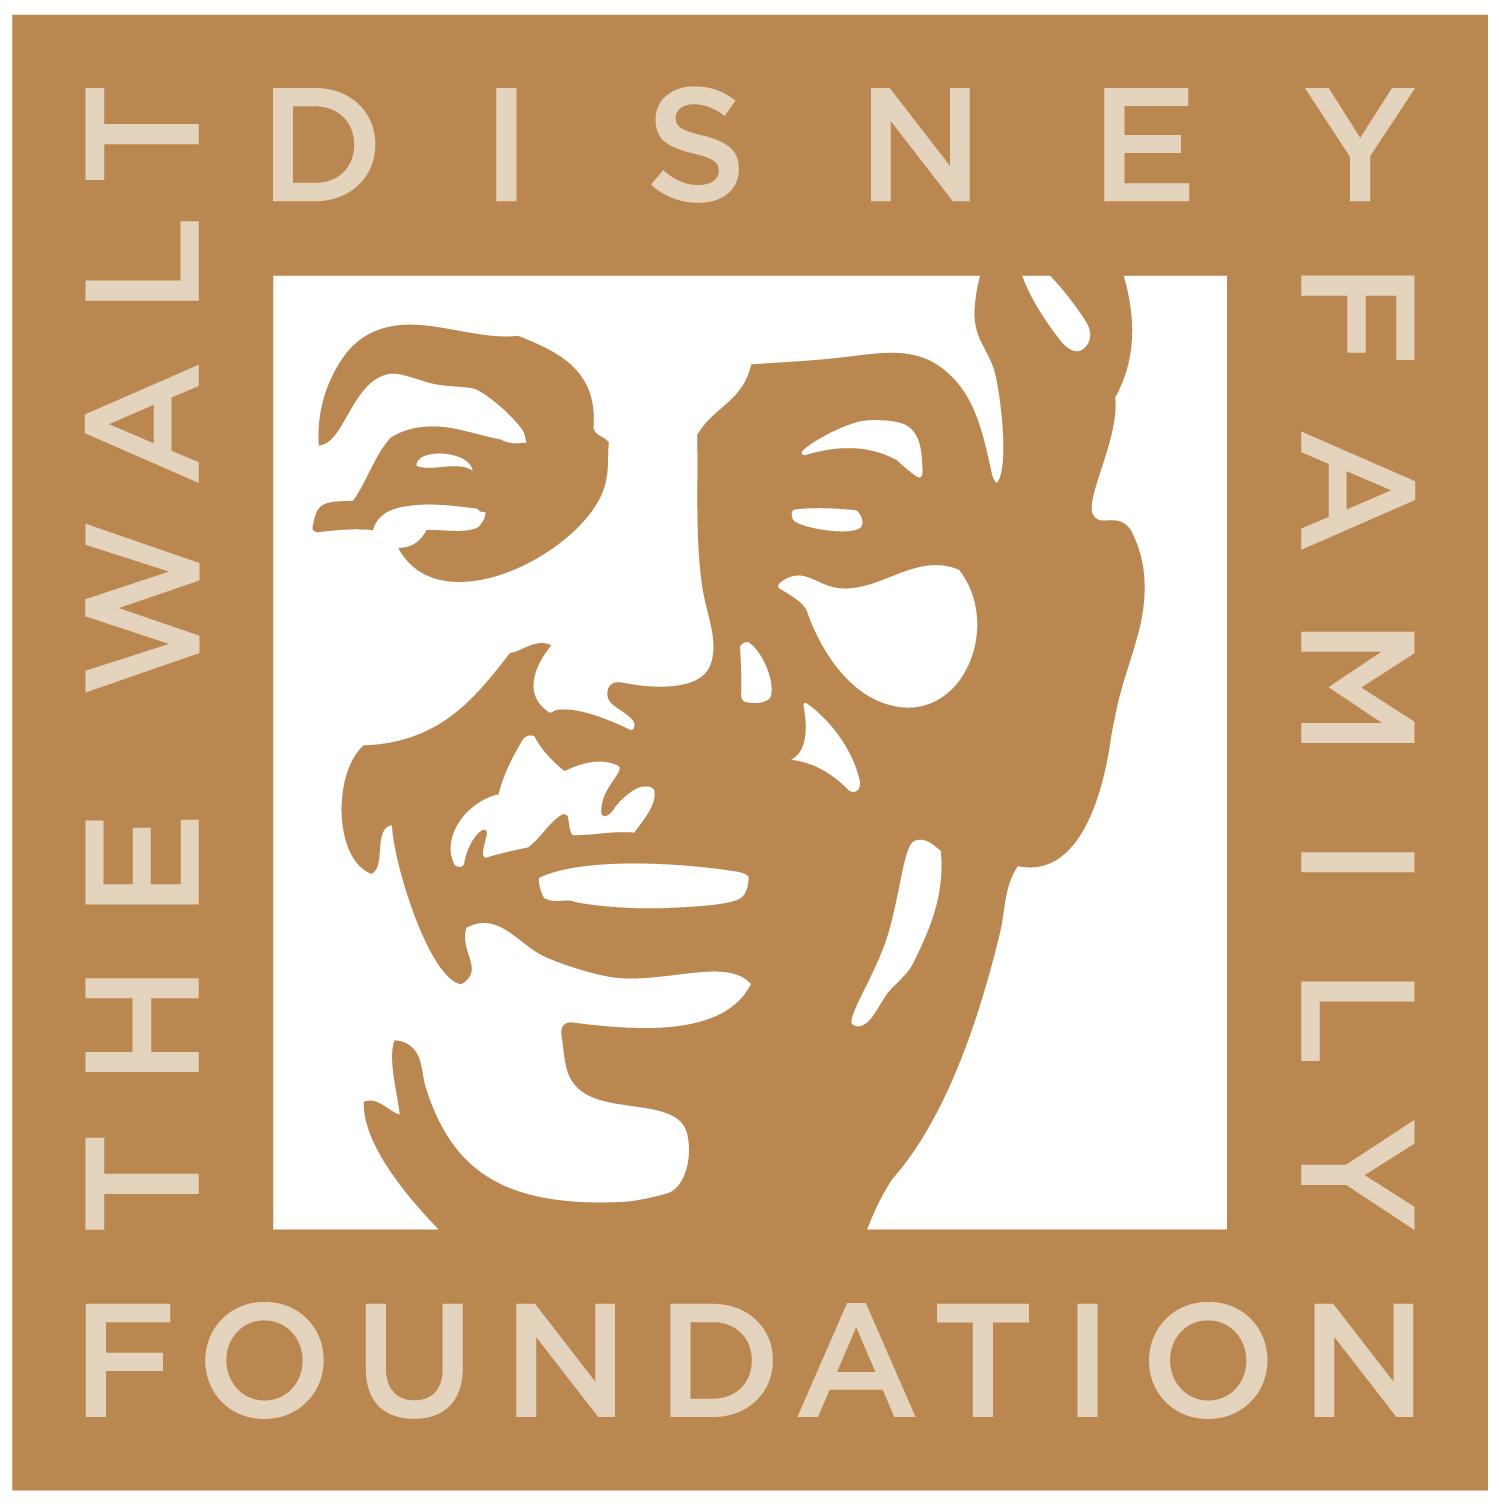 Walt Disney Family Foundation